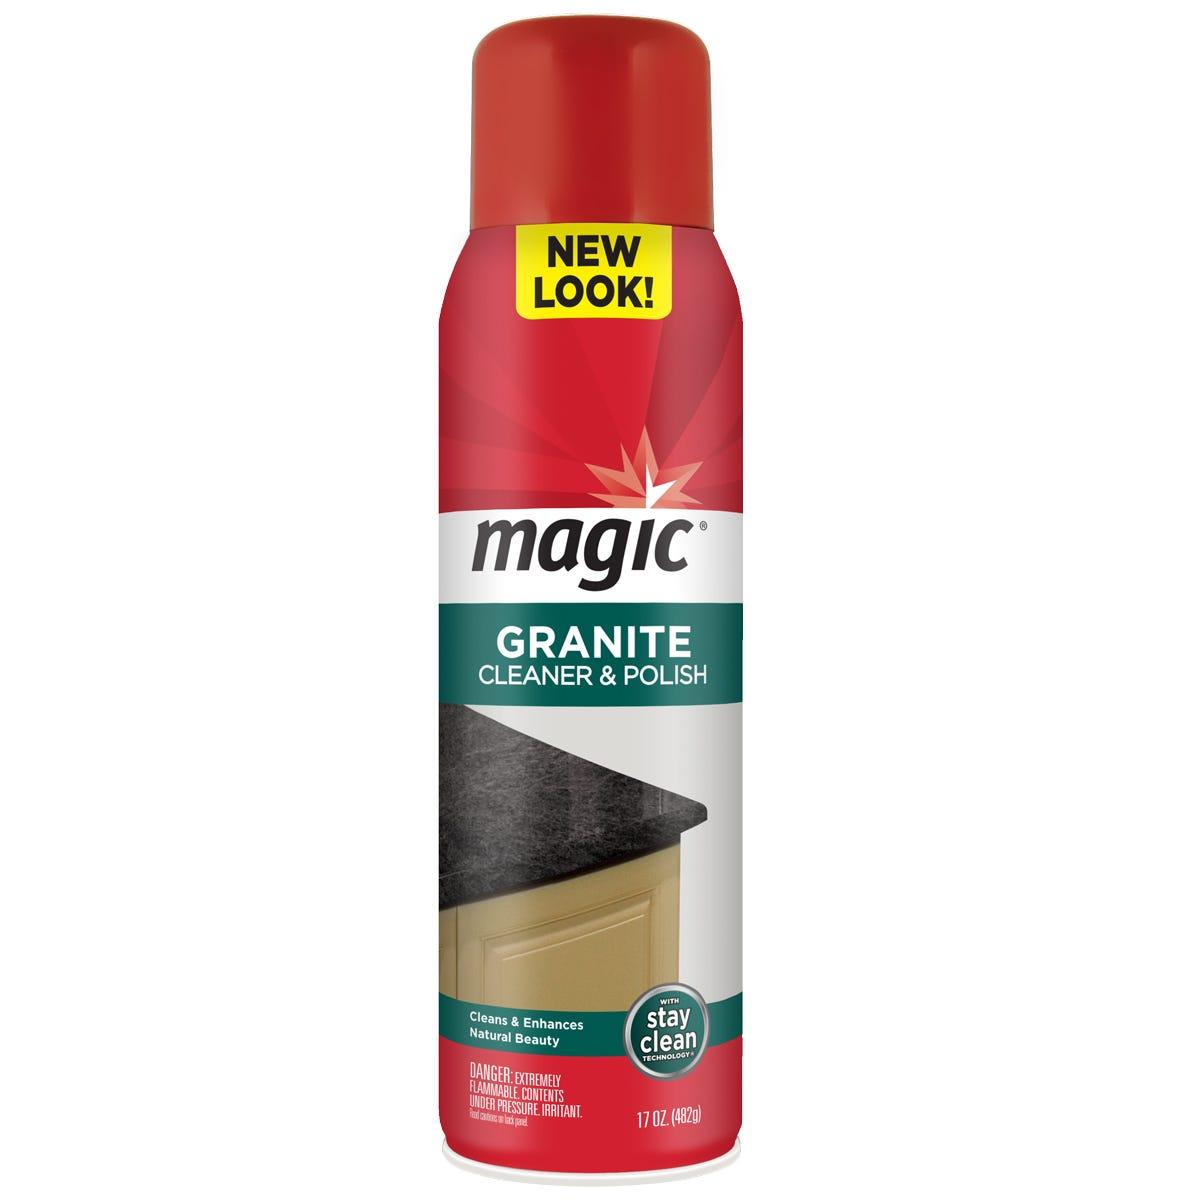 https://googone.com/media/catalog/product/m/a/magic-granite-cleaner-aerosol_front.jpg